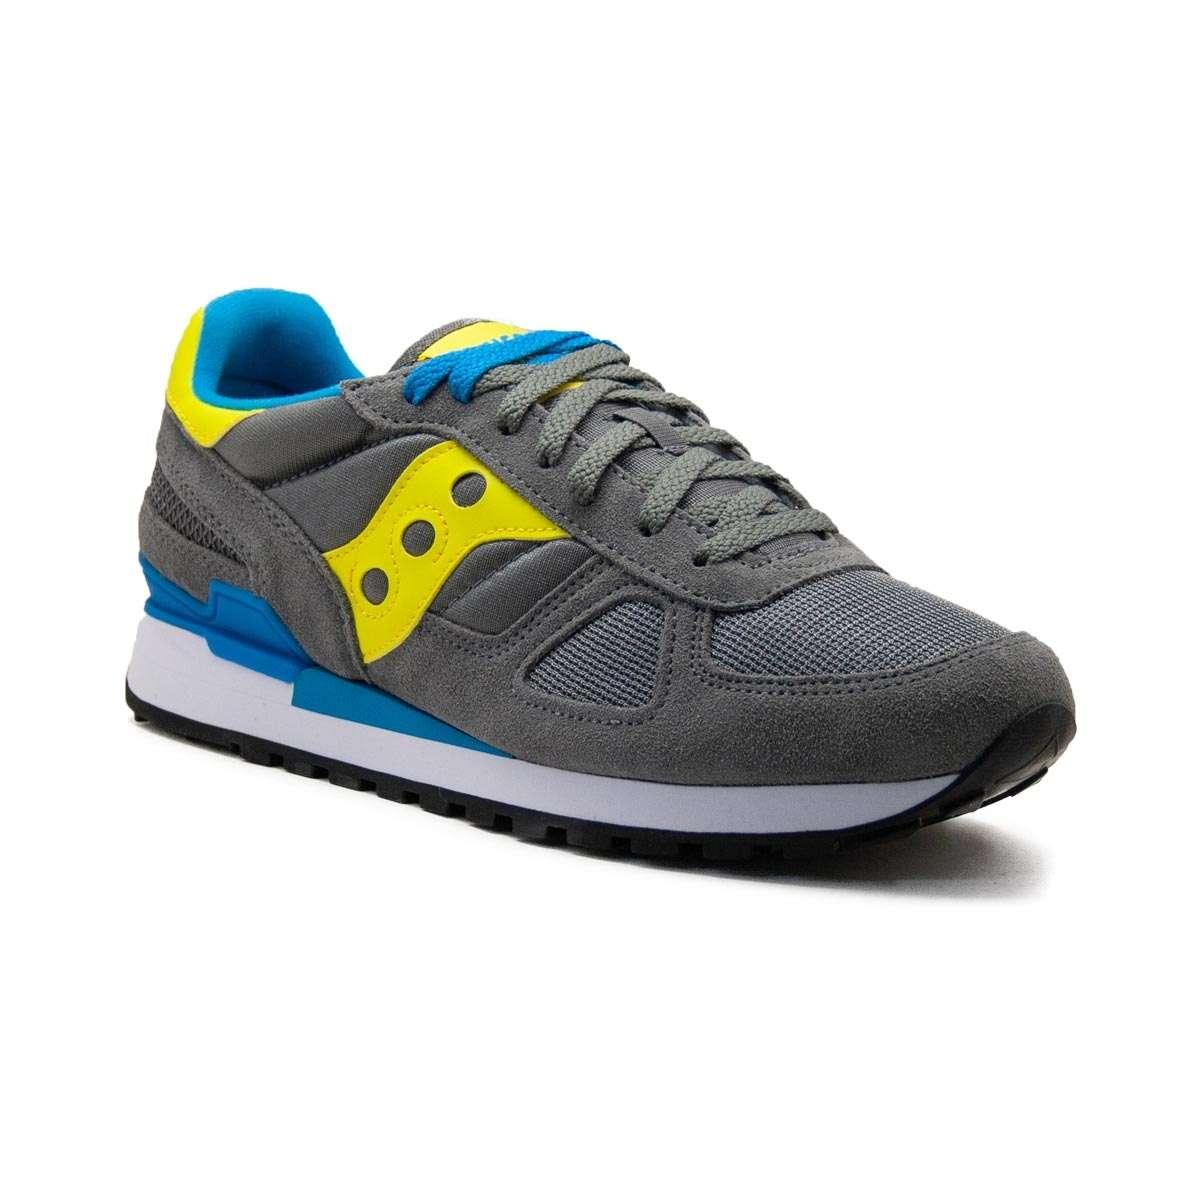 https://www.parmax.com/media/catalog/product/a/i/AI-Outlet_Parmax-Sneackers-Saucony-S2108-535-D.jpg